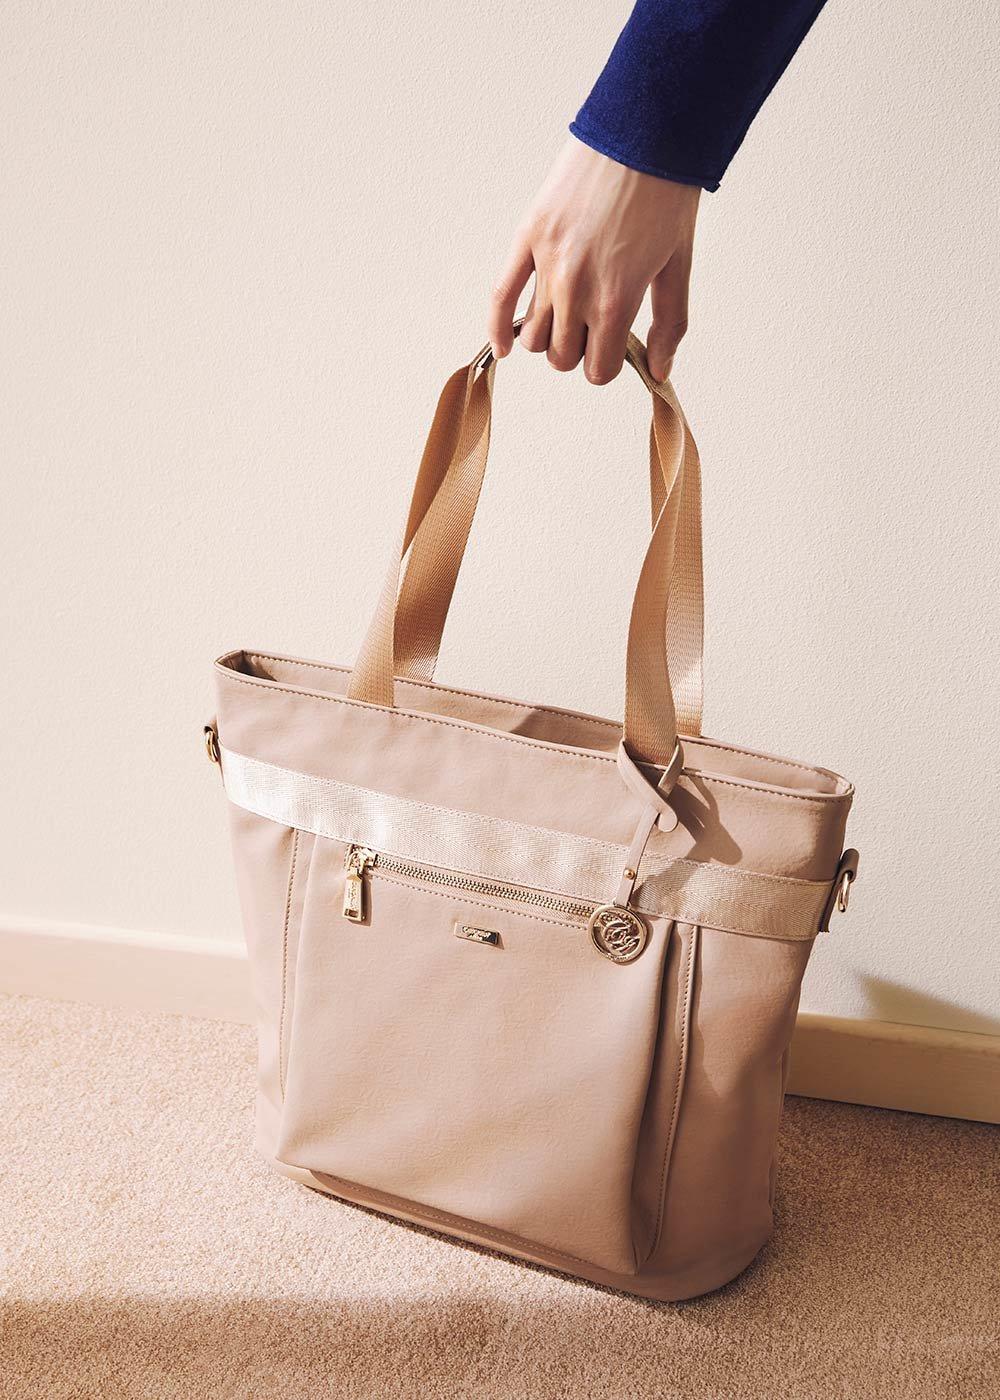 Shopping bag Becky multiscomparto - Doeskin - Donna